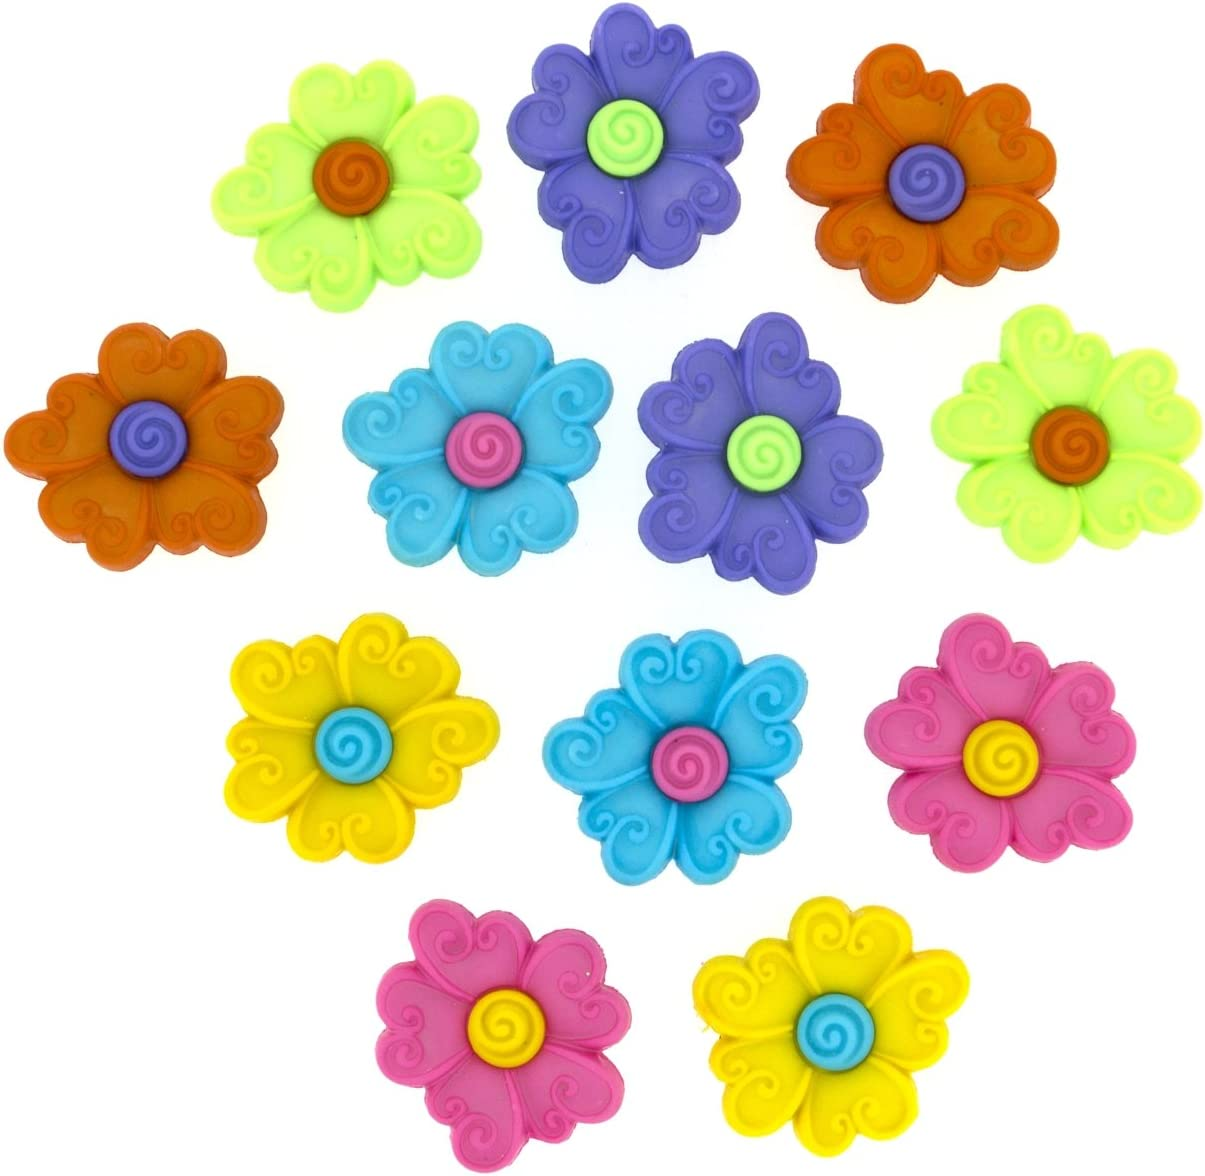 Dress It Up 2242Swirl Center Flower Novelty Embellishments